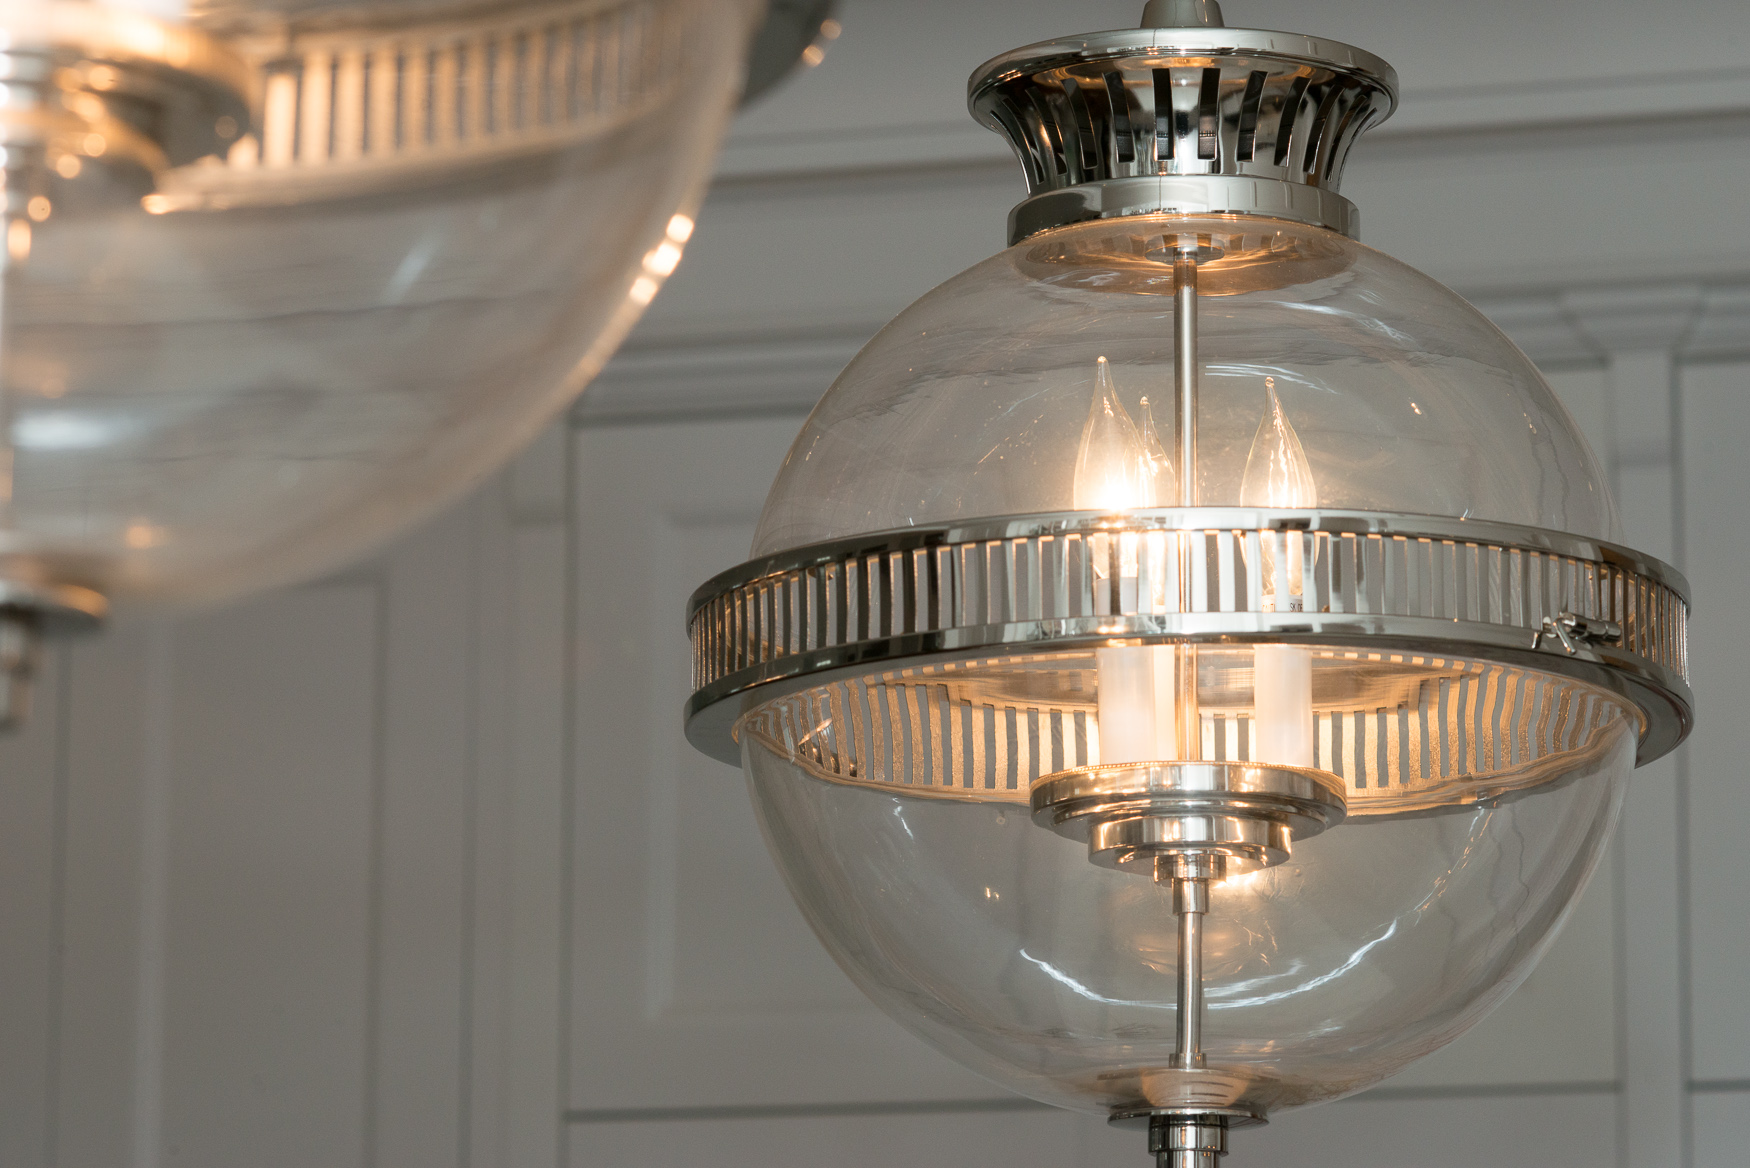 glass globe visual comfort light fixture in chicago luxury home